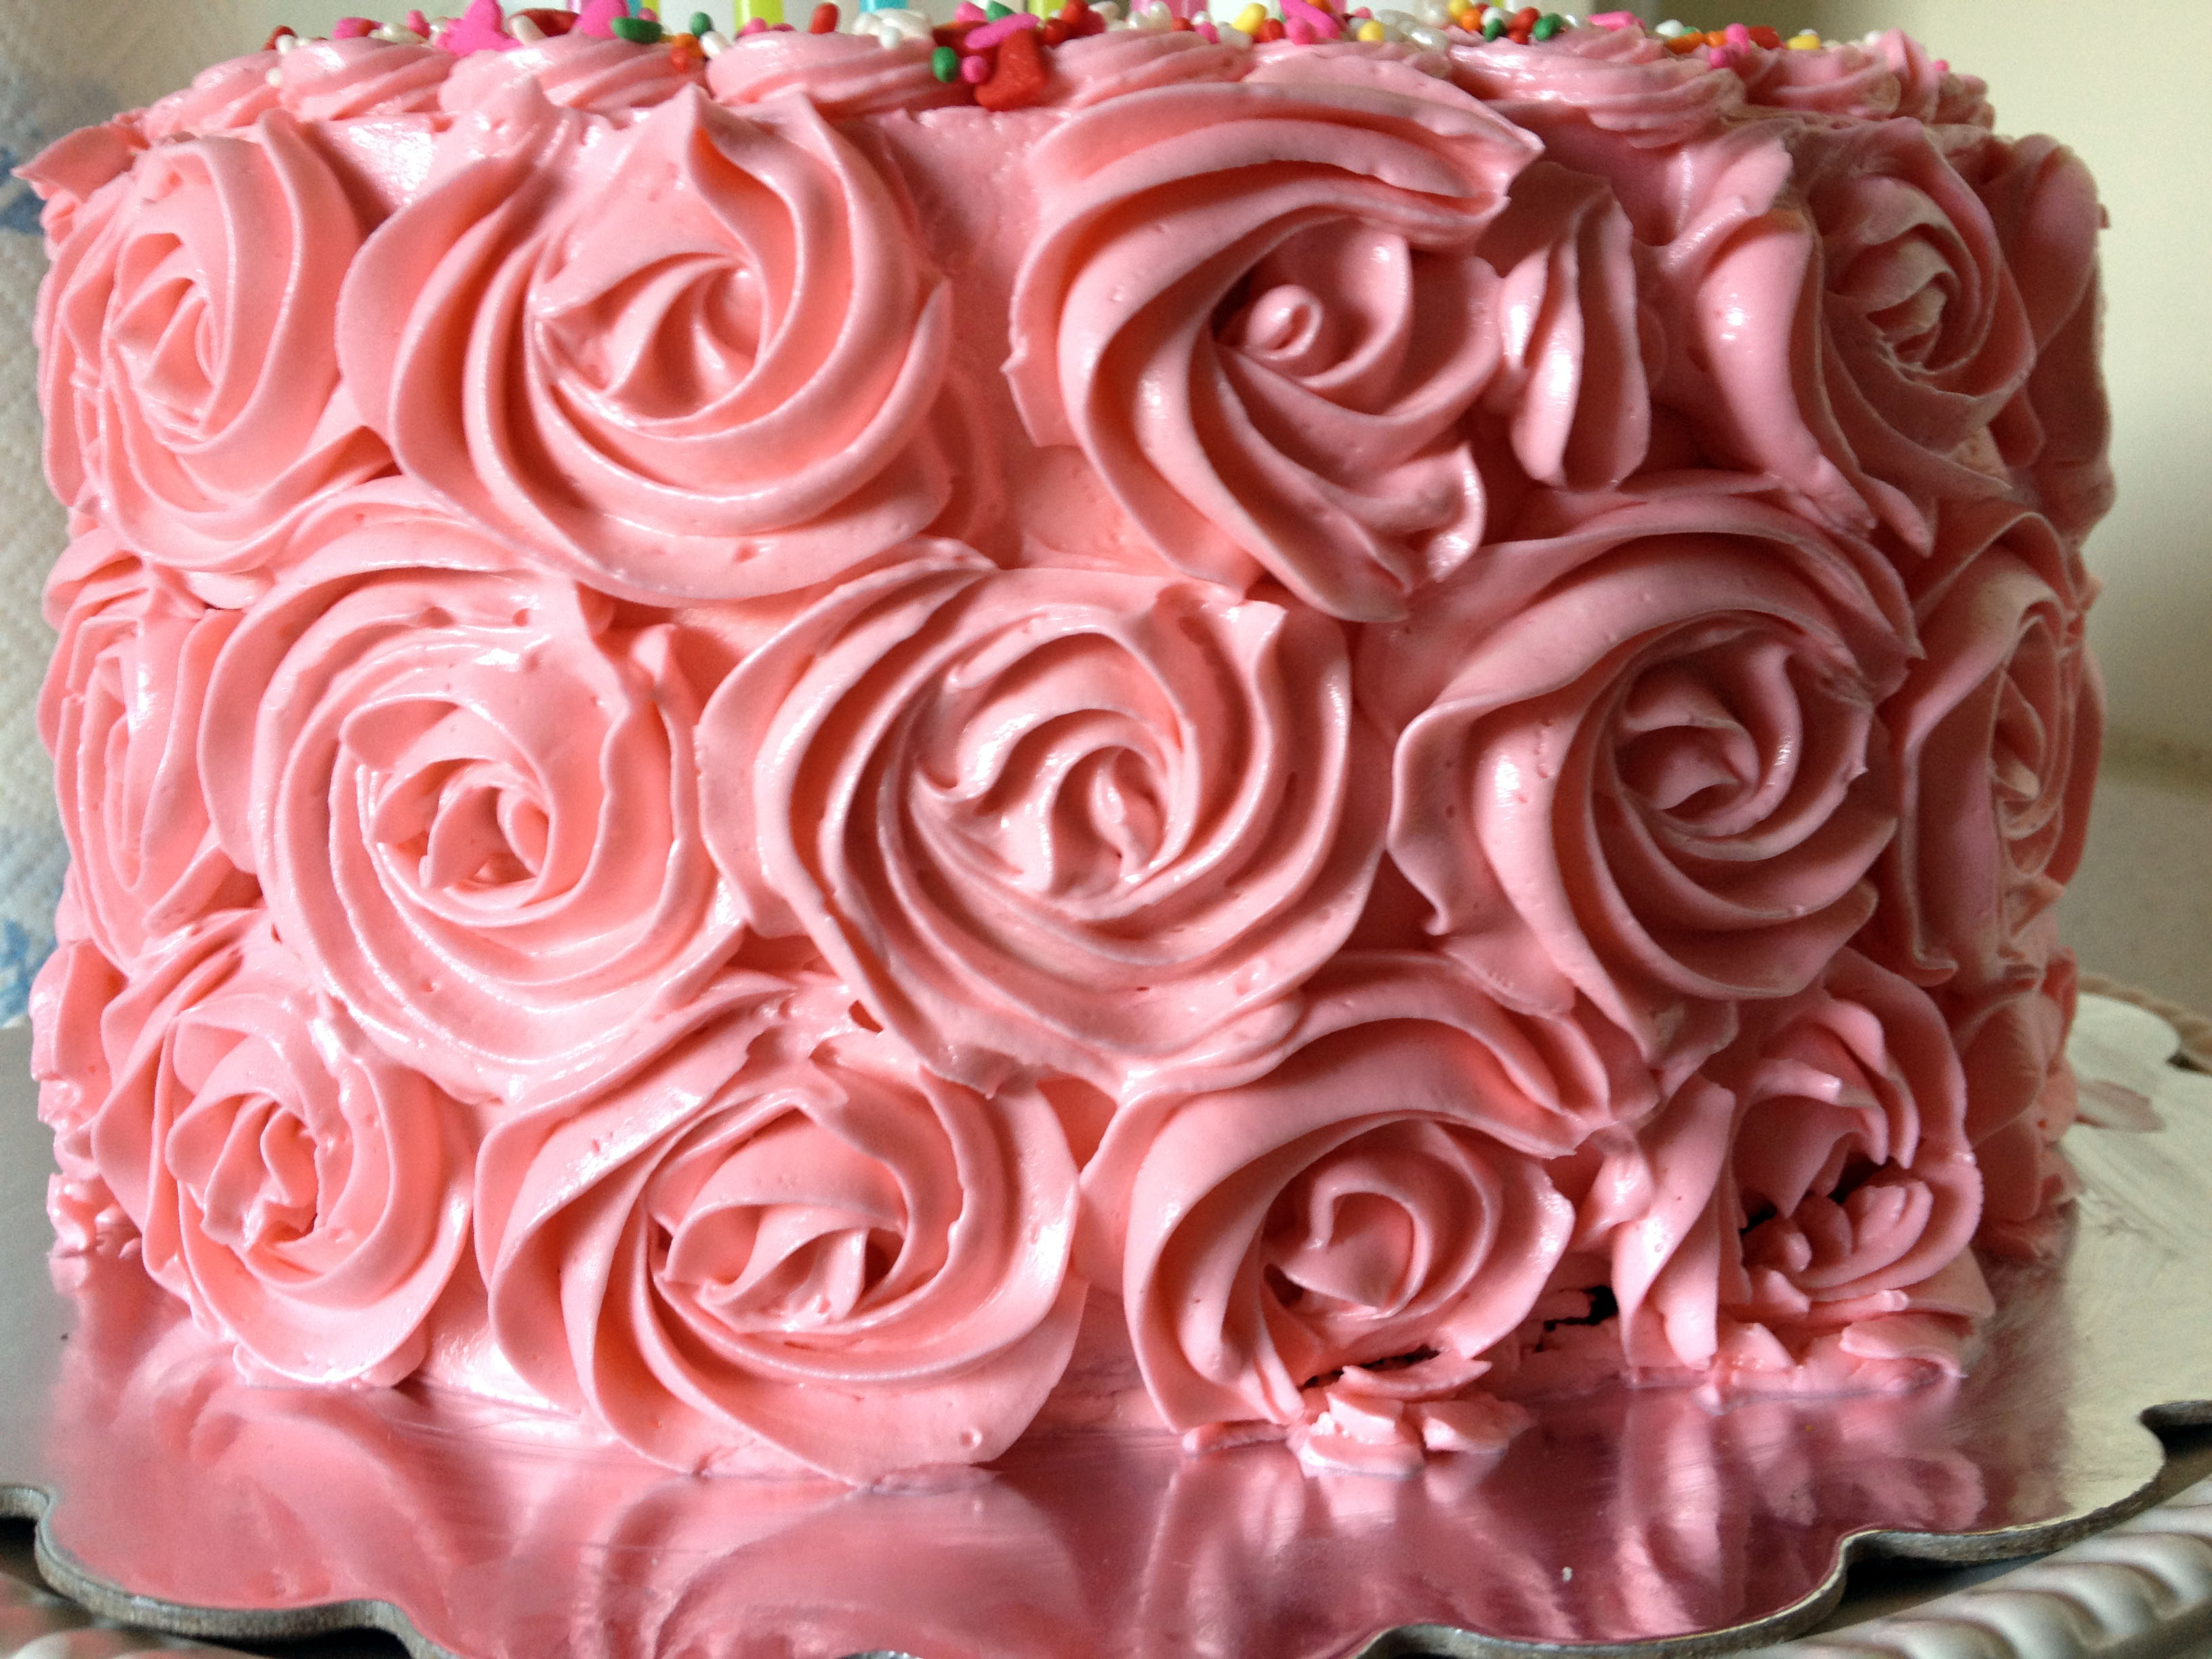 rosette icing tip